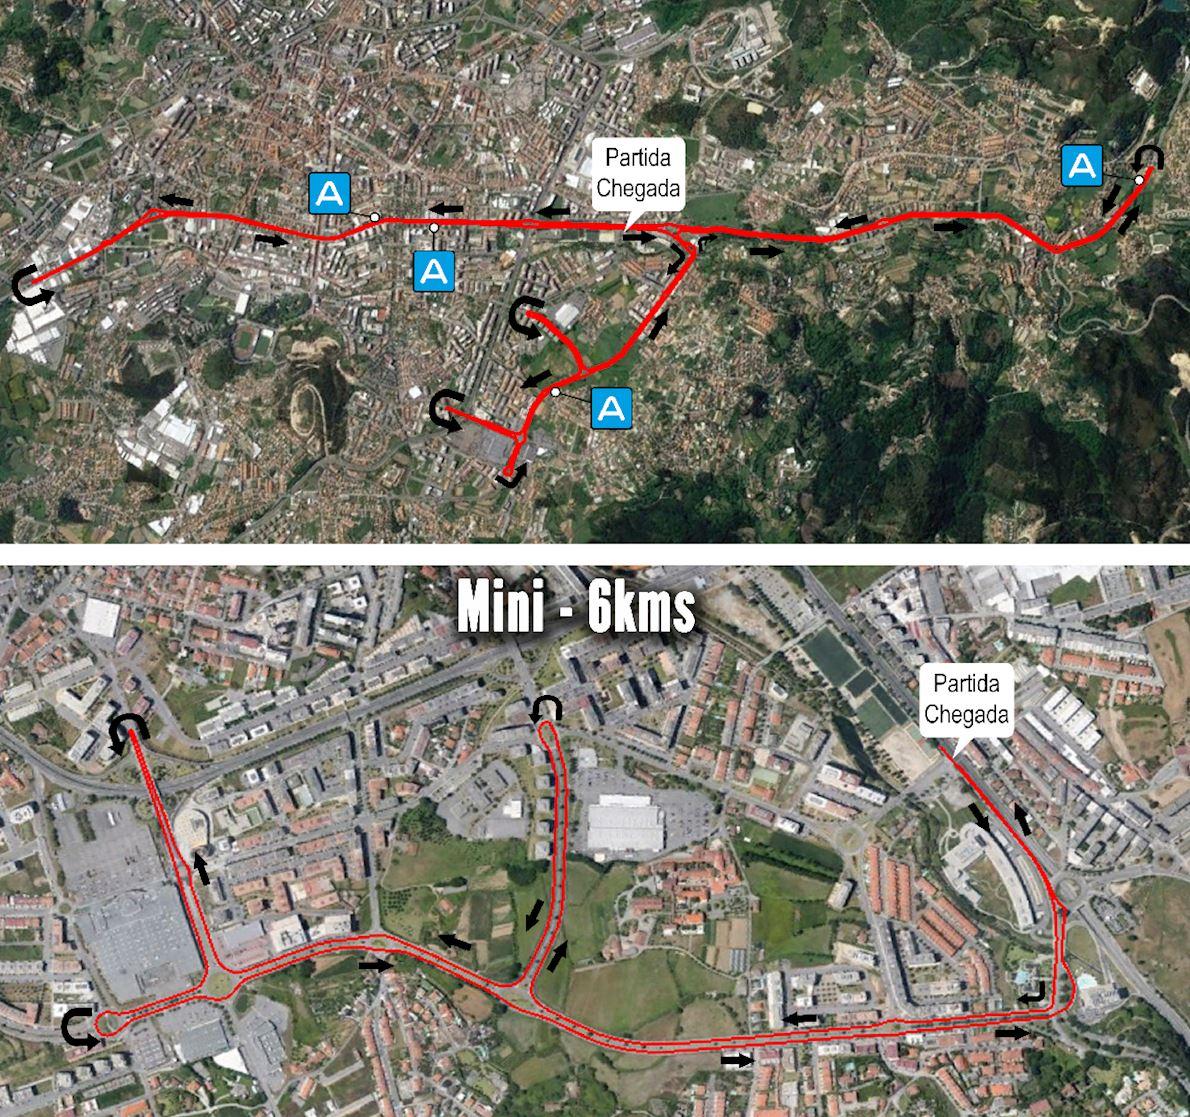 Braga Half Marathon MAPA DEL RECORRIDO DE